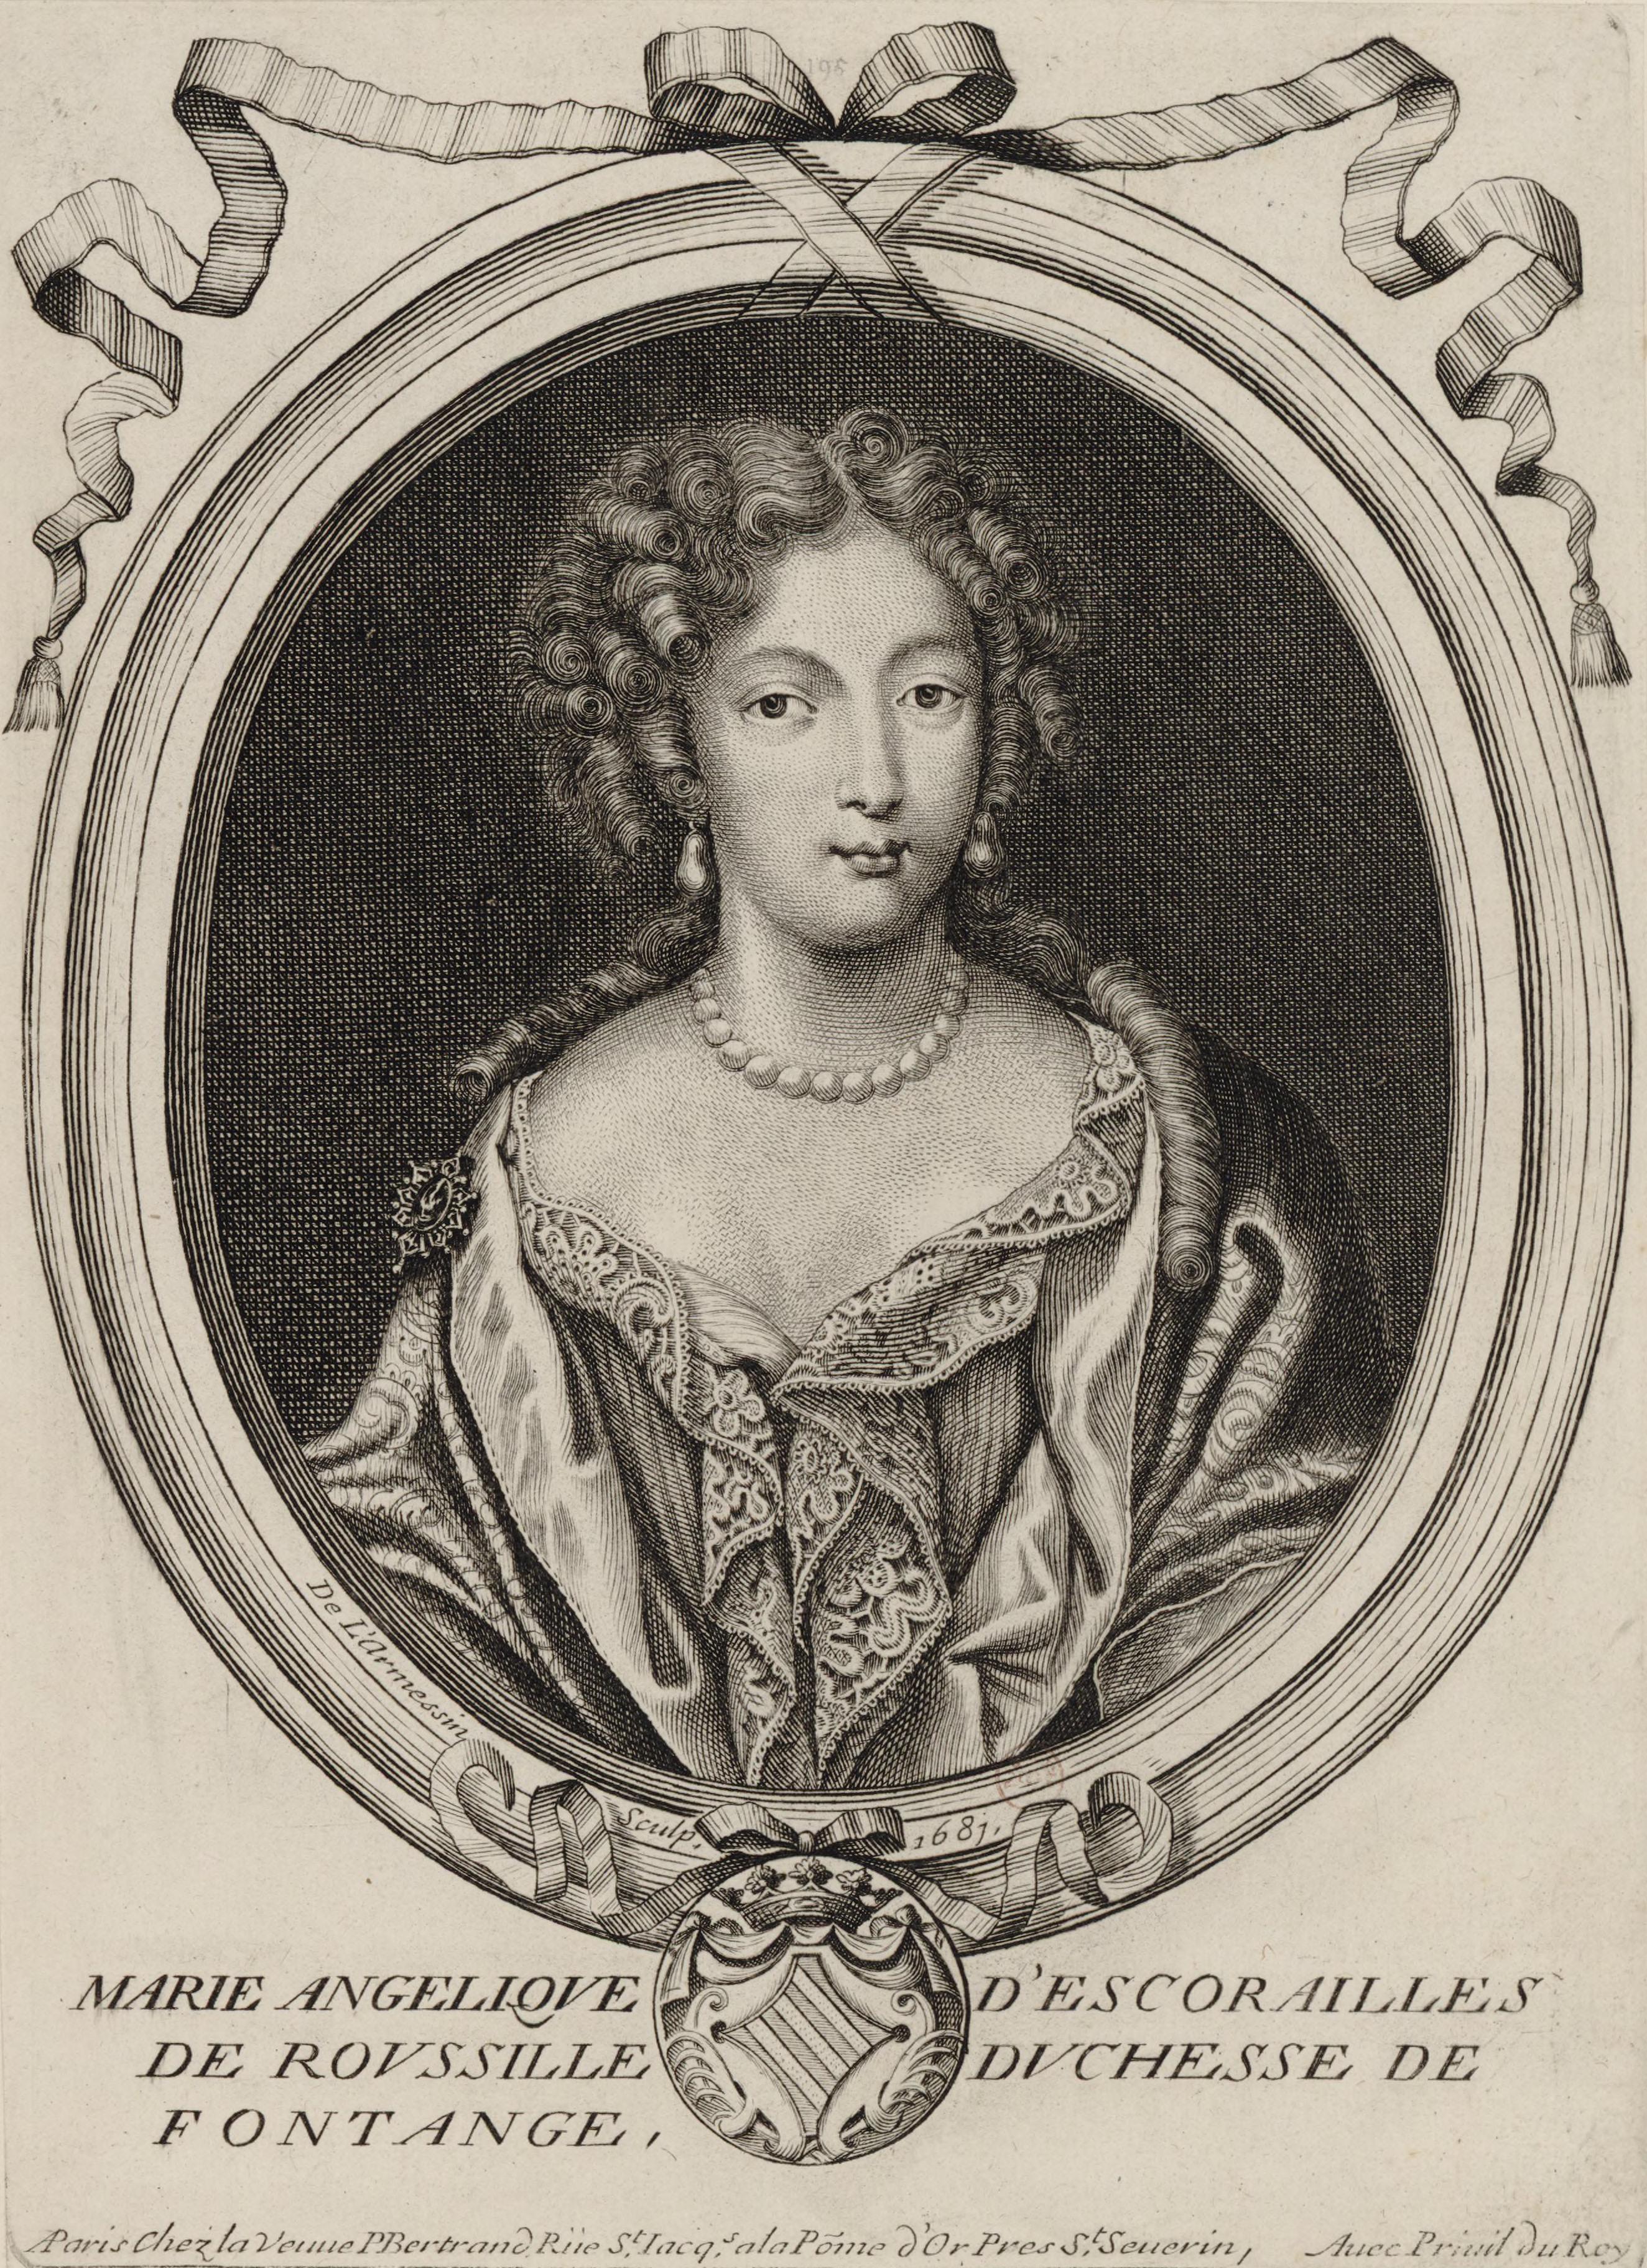 Файл:1681 Engraving of Marie Angélique de Scorailles, Duchess of Fontanges  (Nicolas II